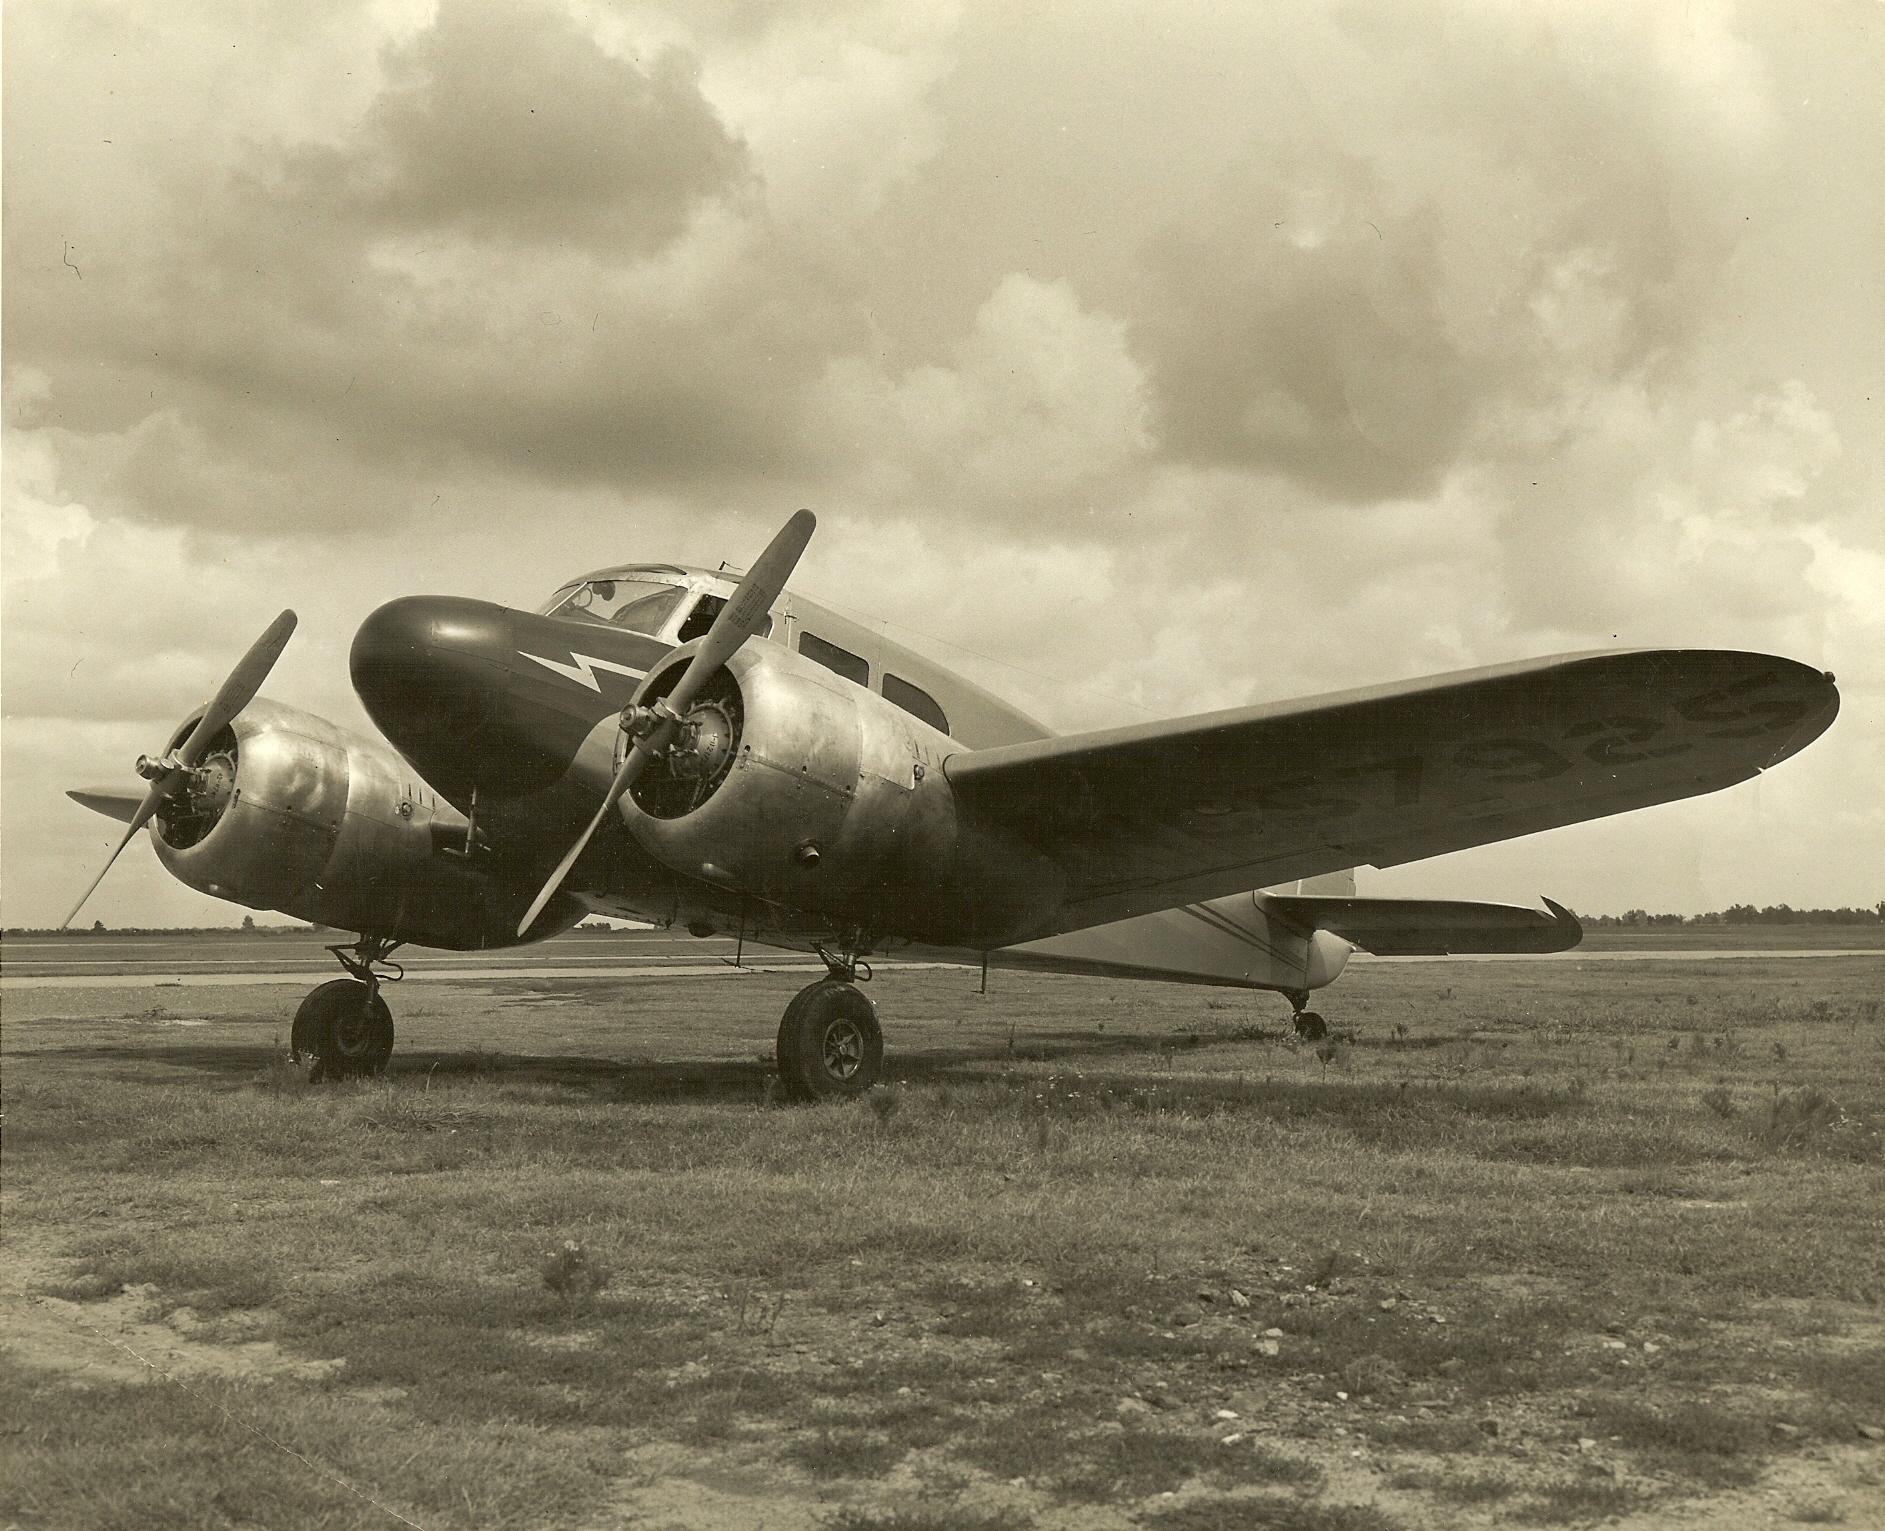 old prop plane in grass.jpg